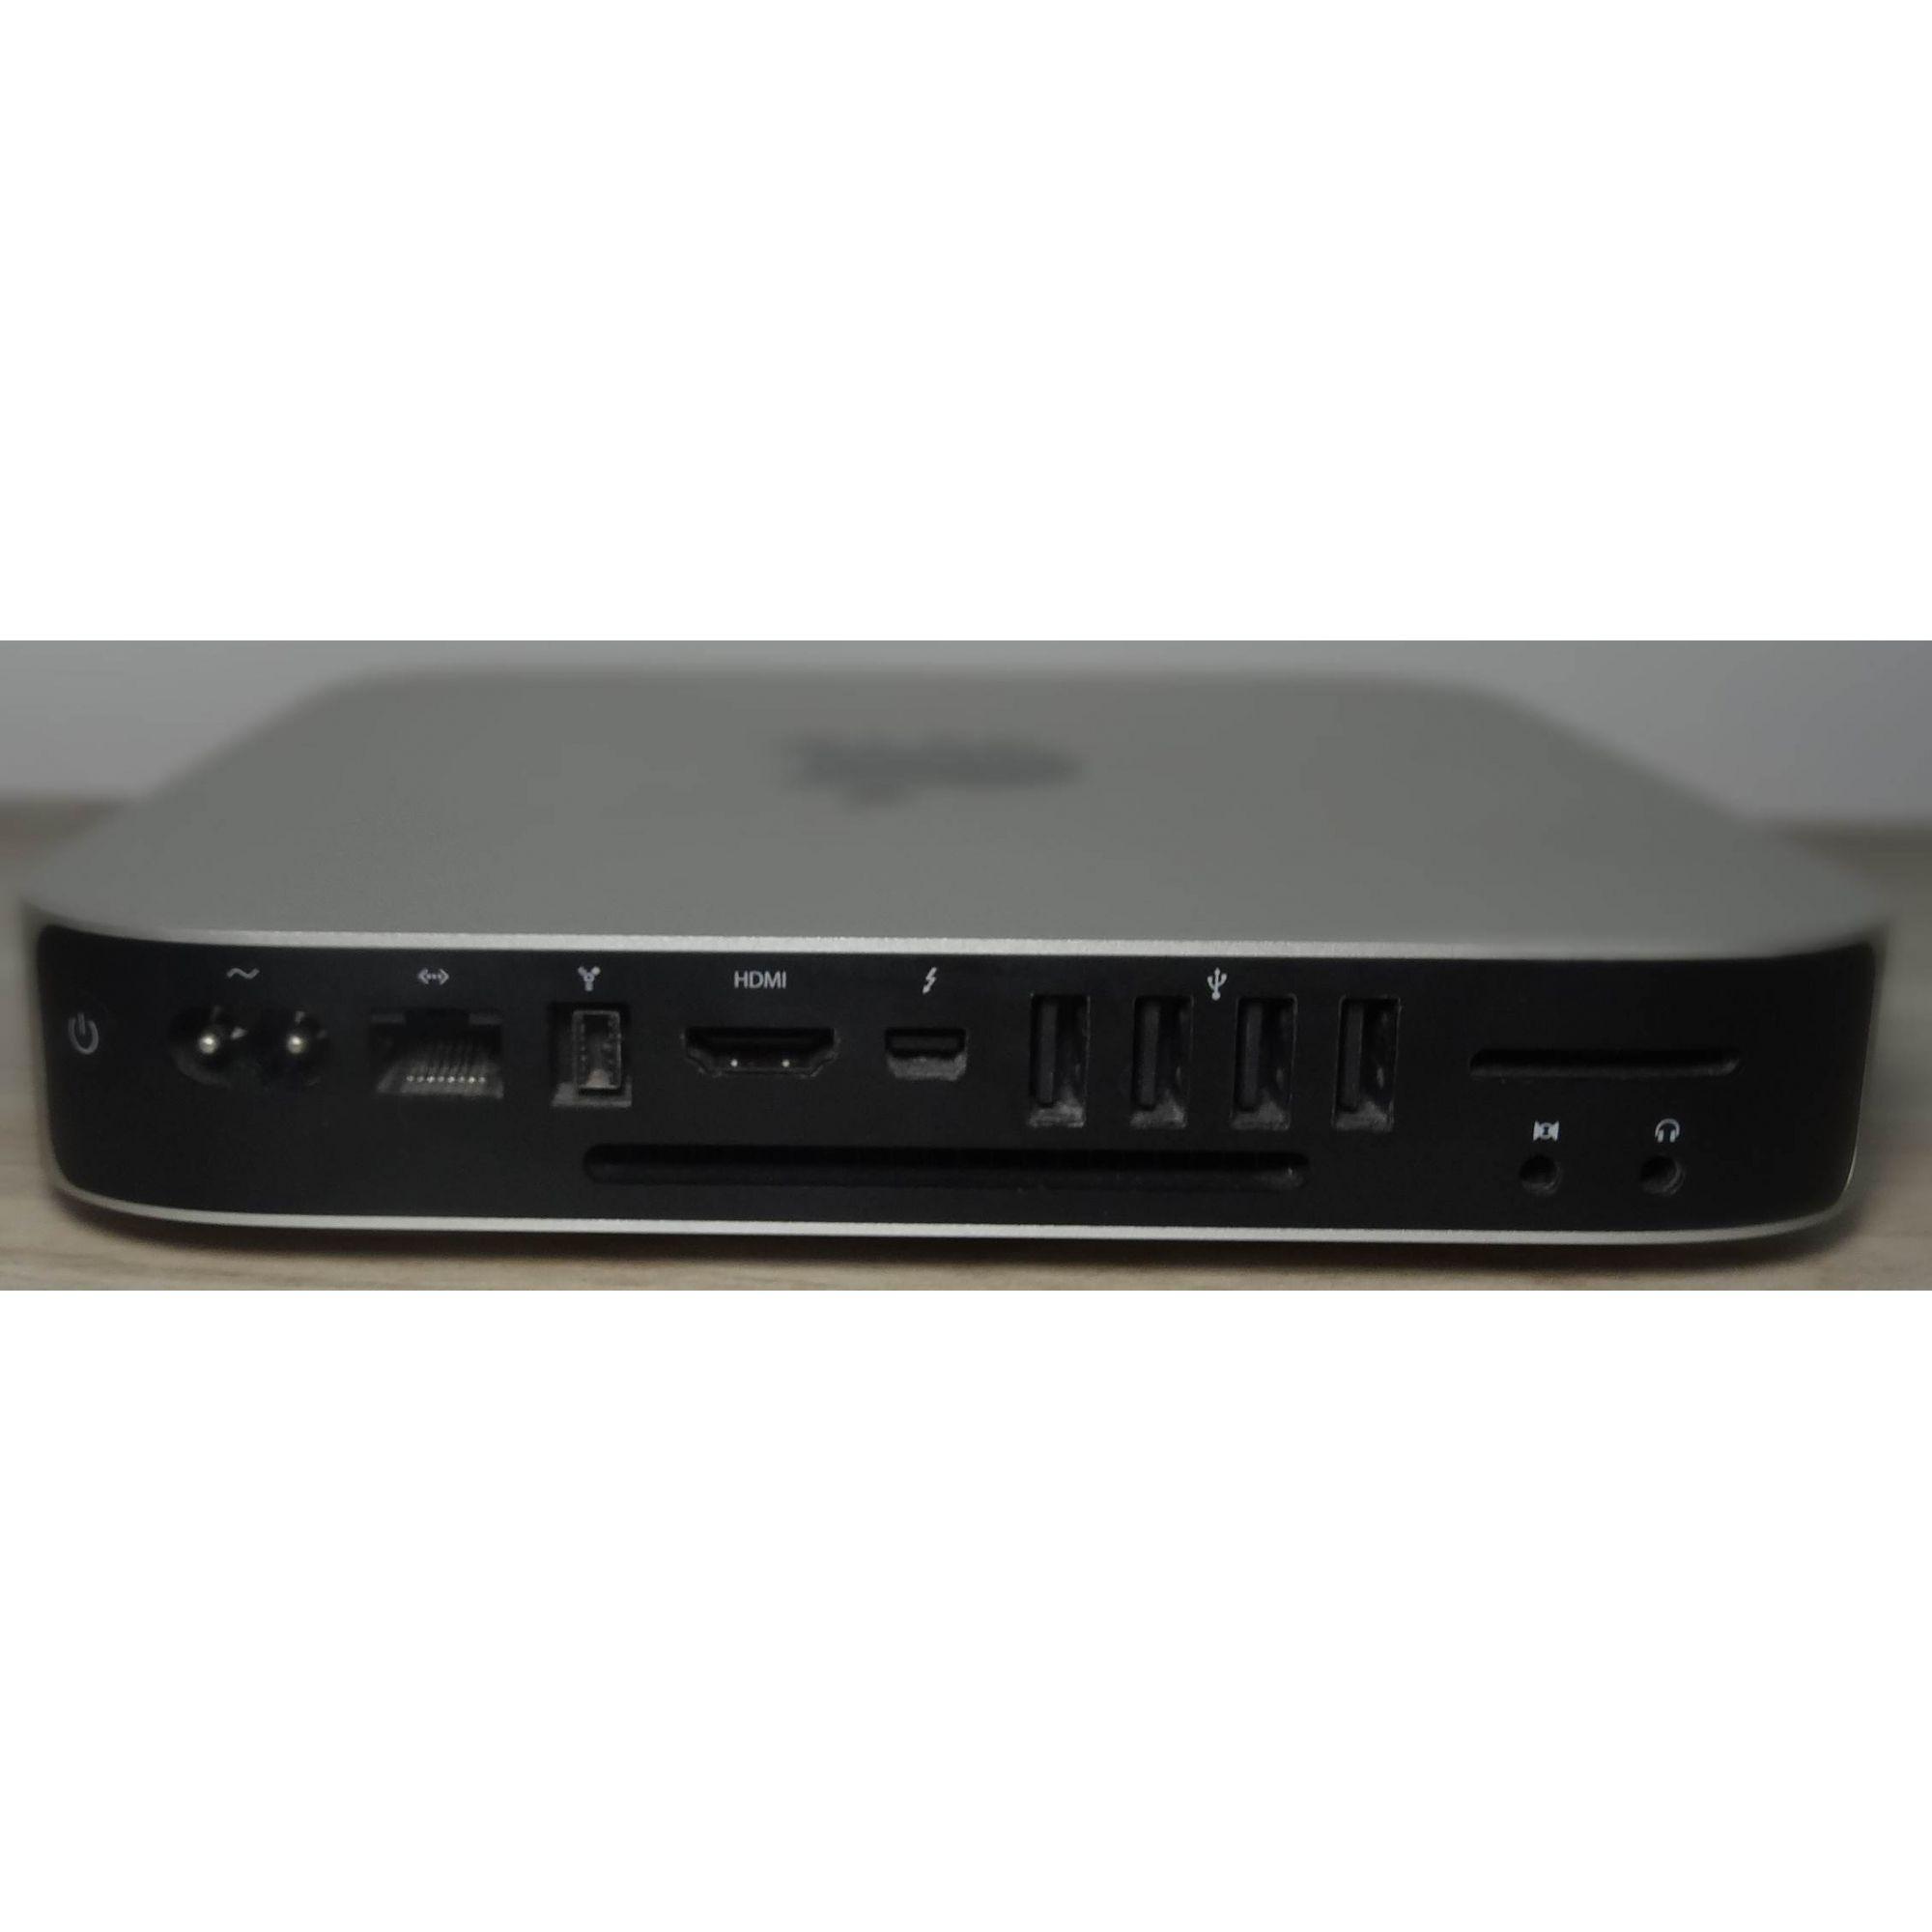 Mac Mini MC815LL/A Intel Core i5 2.3GHz 4GB 500GB HD (Não Enviamos)